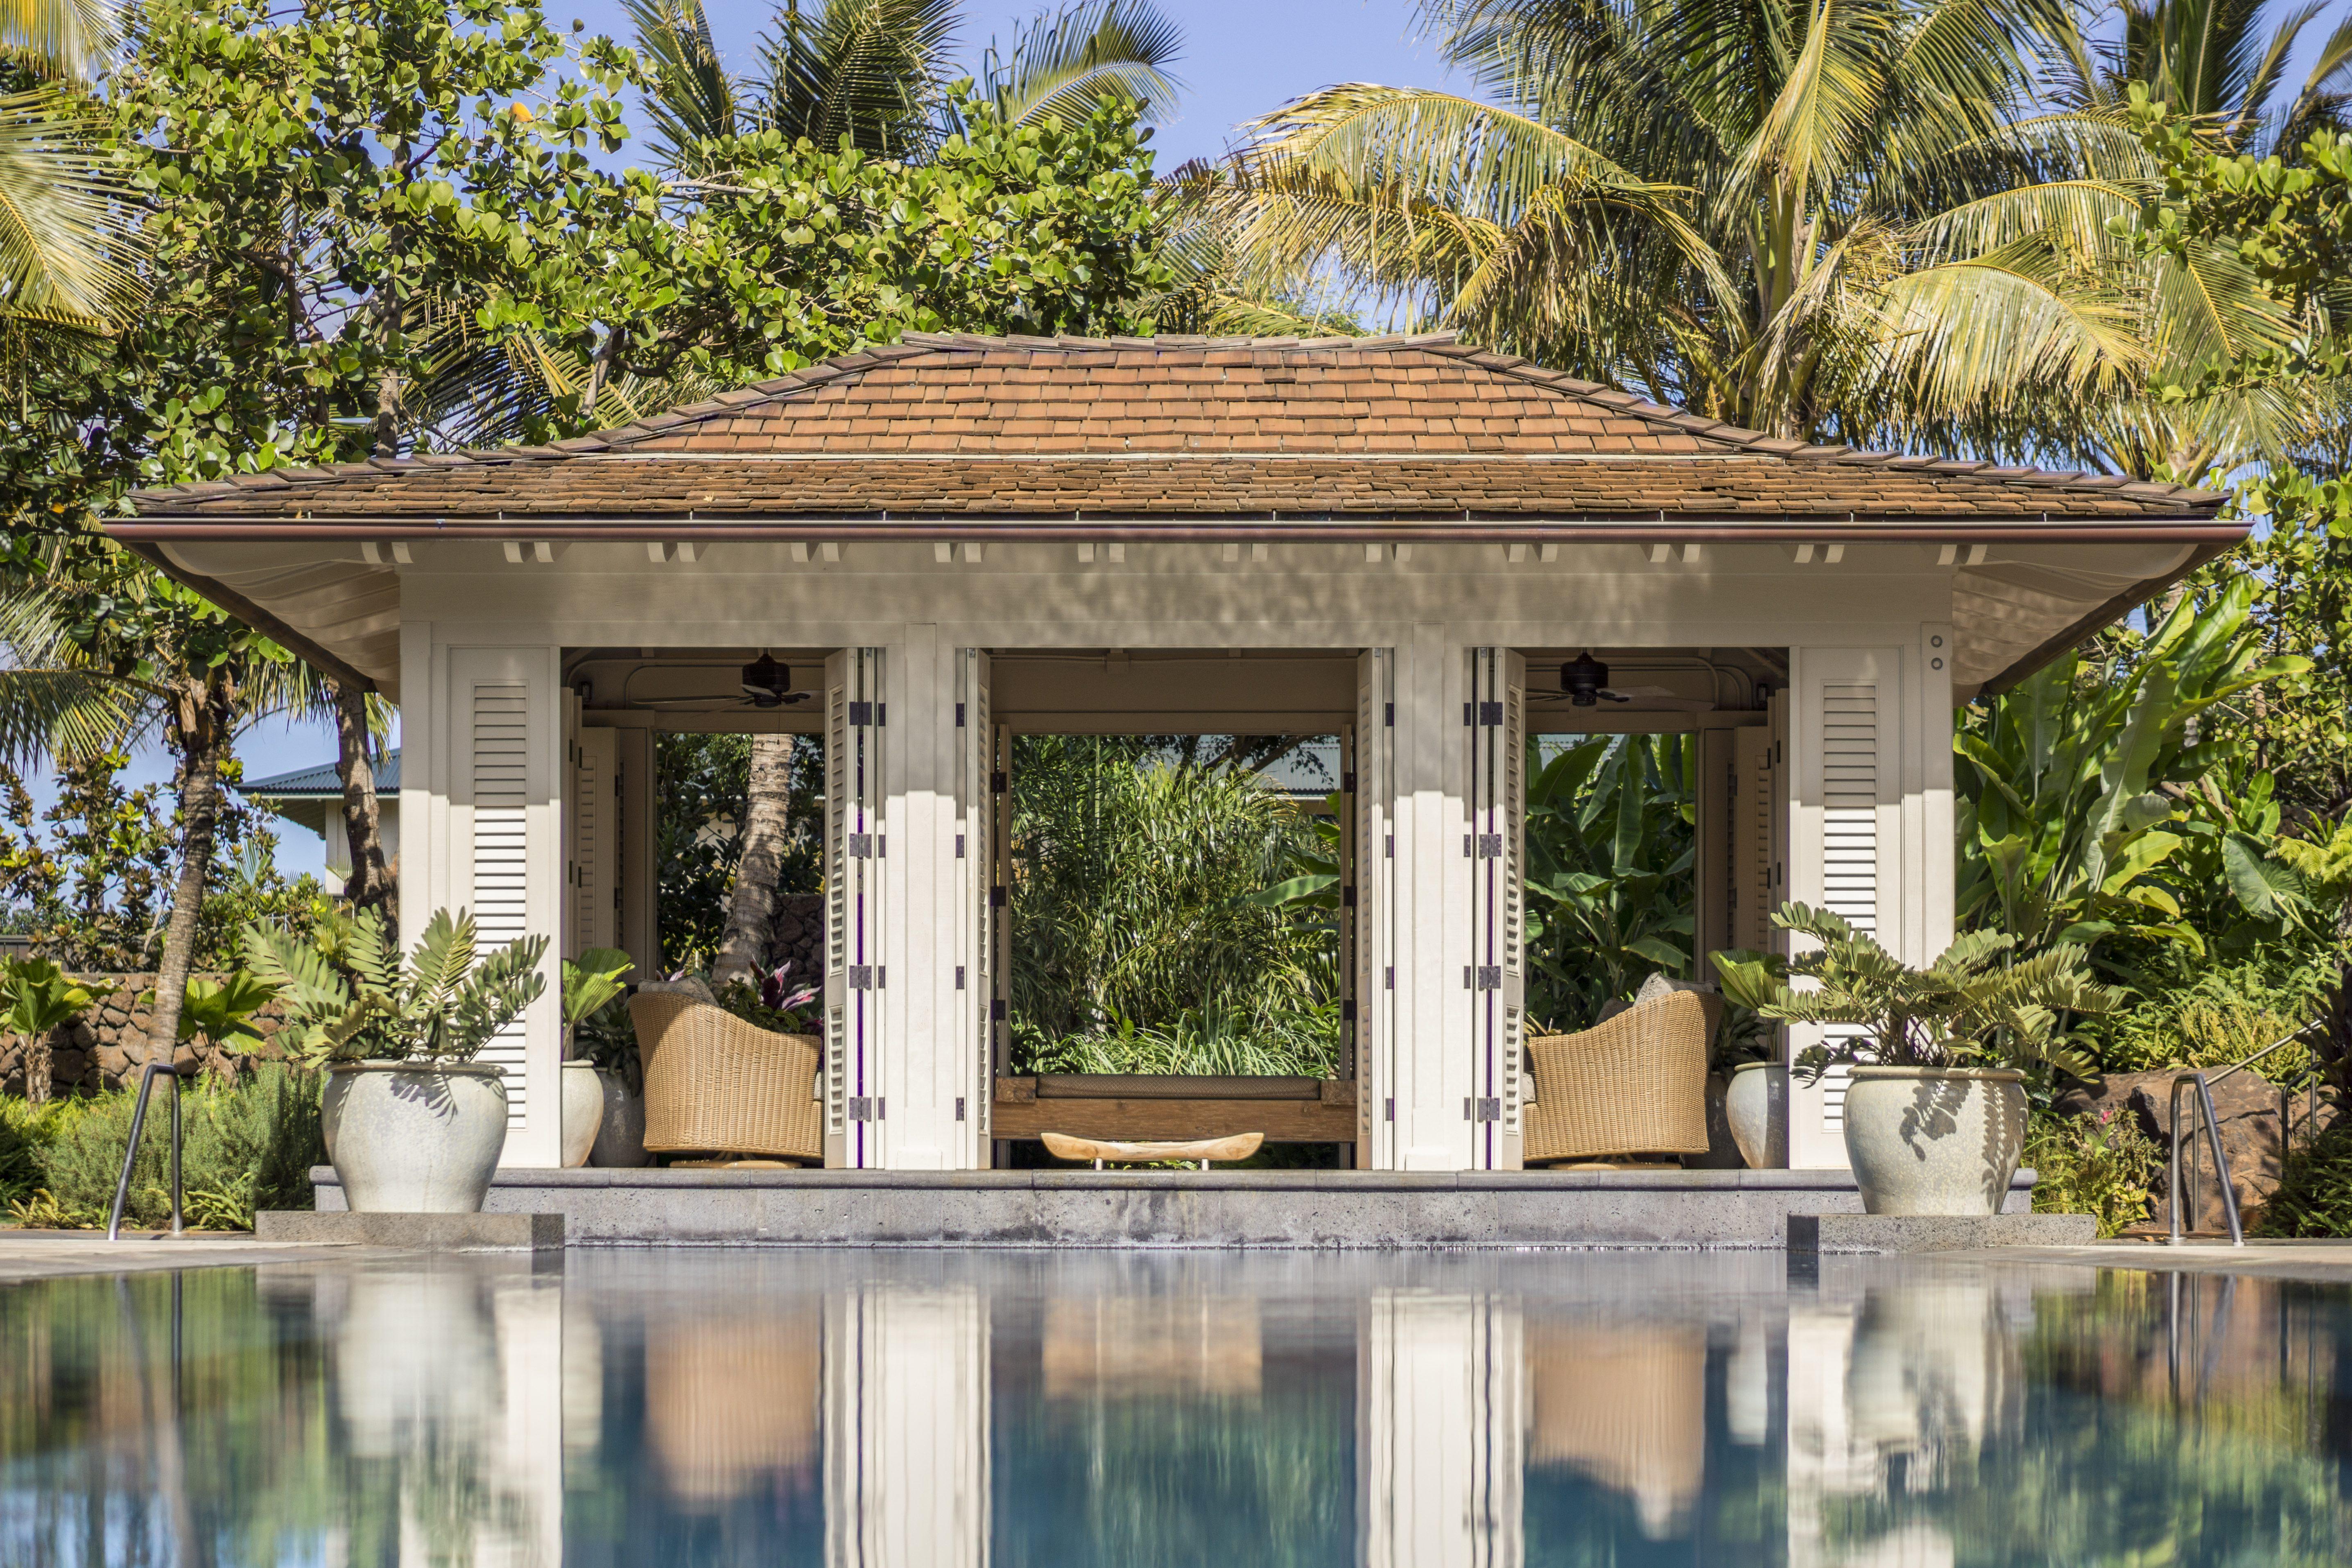 The Spa At Kauai S Kukui Ula Sublime Hawaii Real Estate